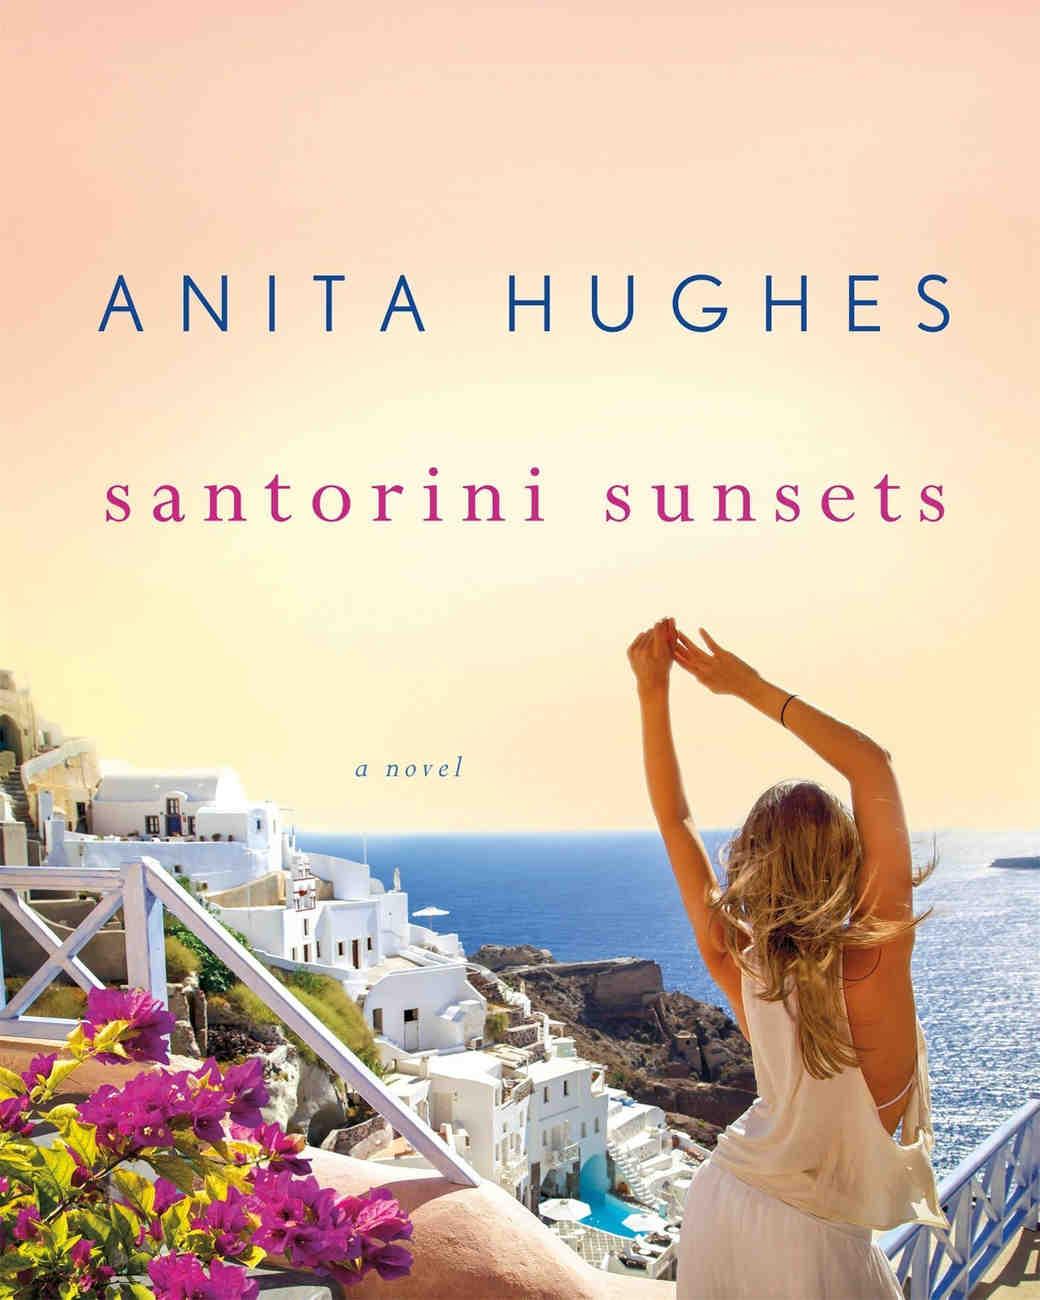 santorini-sunsets-cover-anita-hughes-0616.jpg